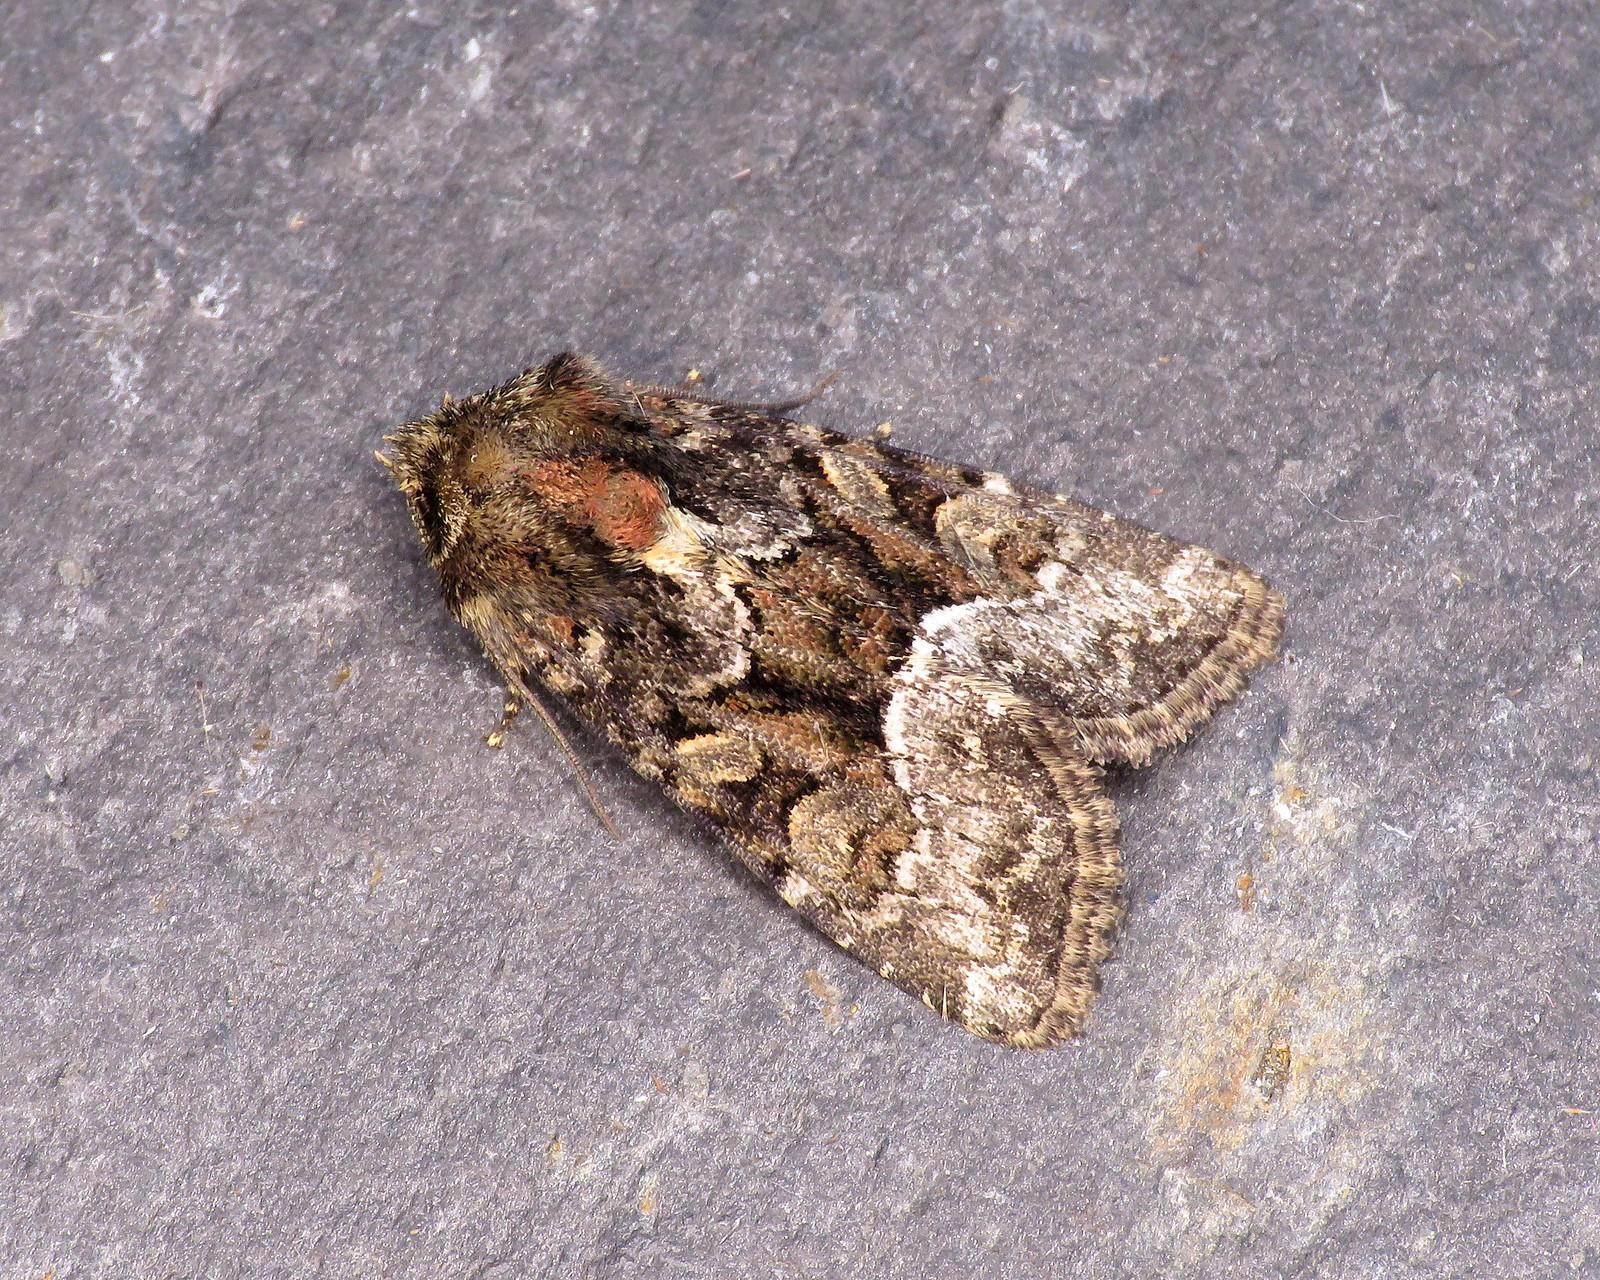 73.173x Marbled Minor - Oligia strigilis agg.